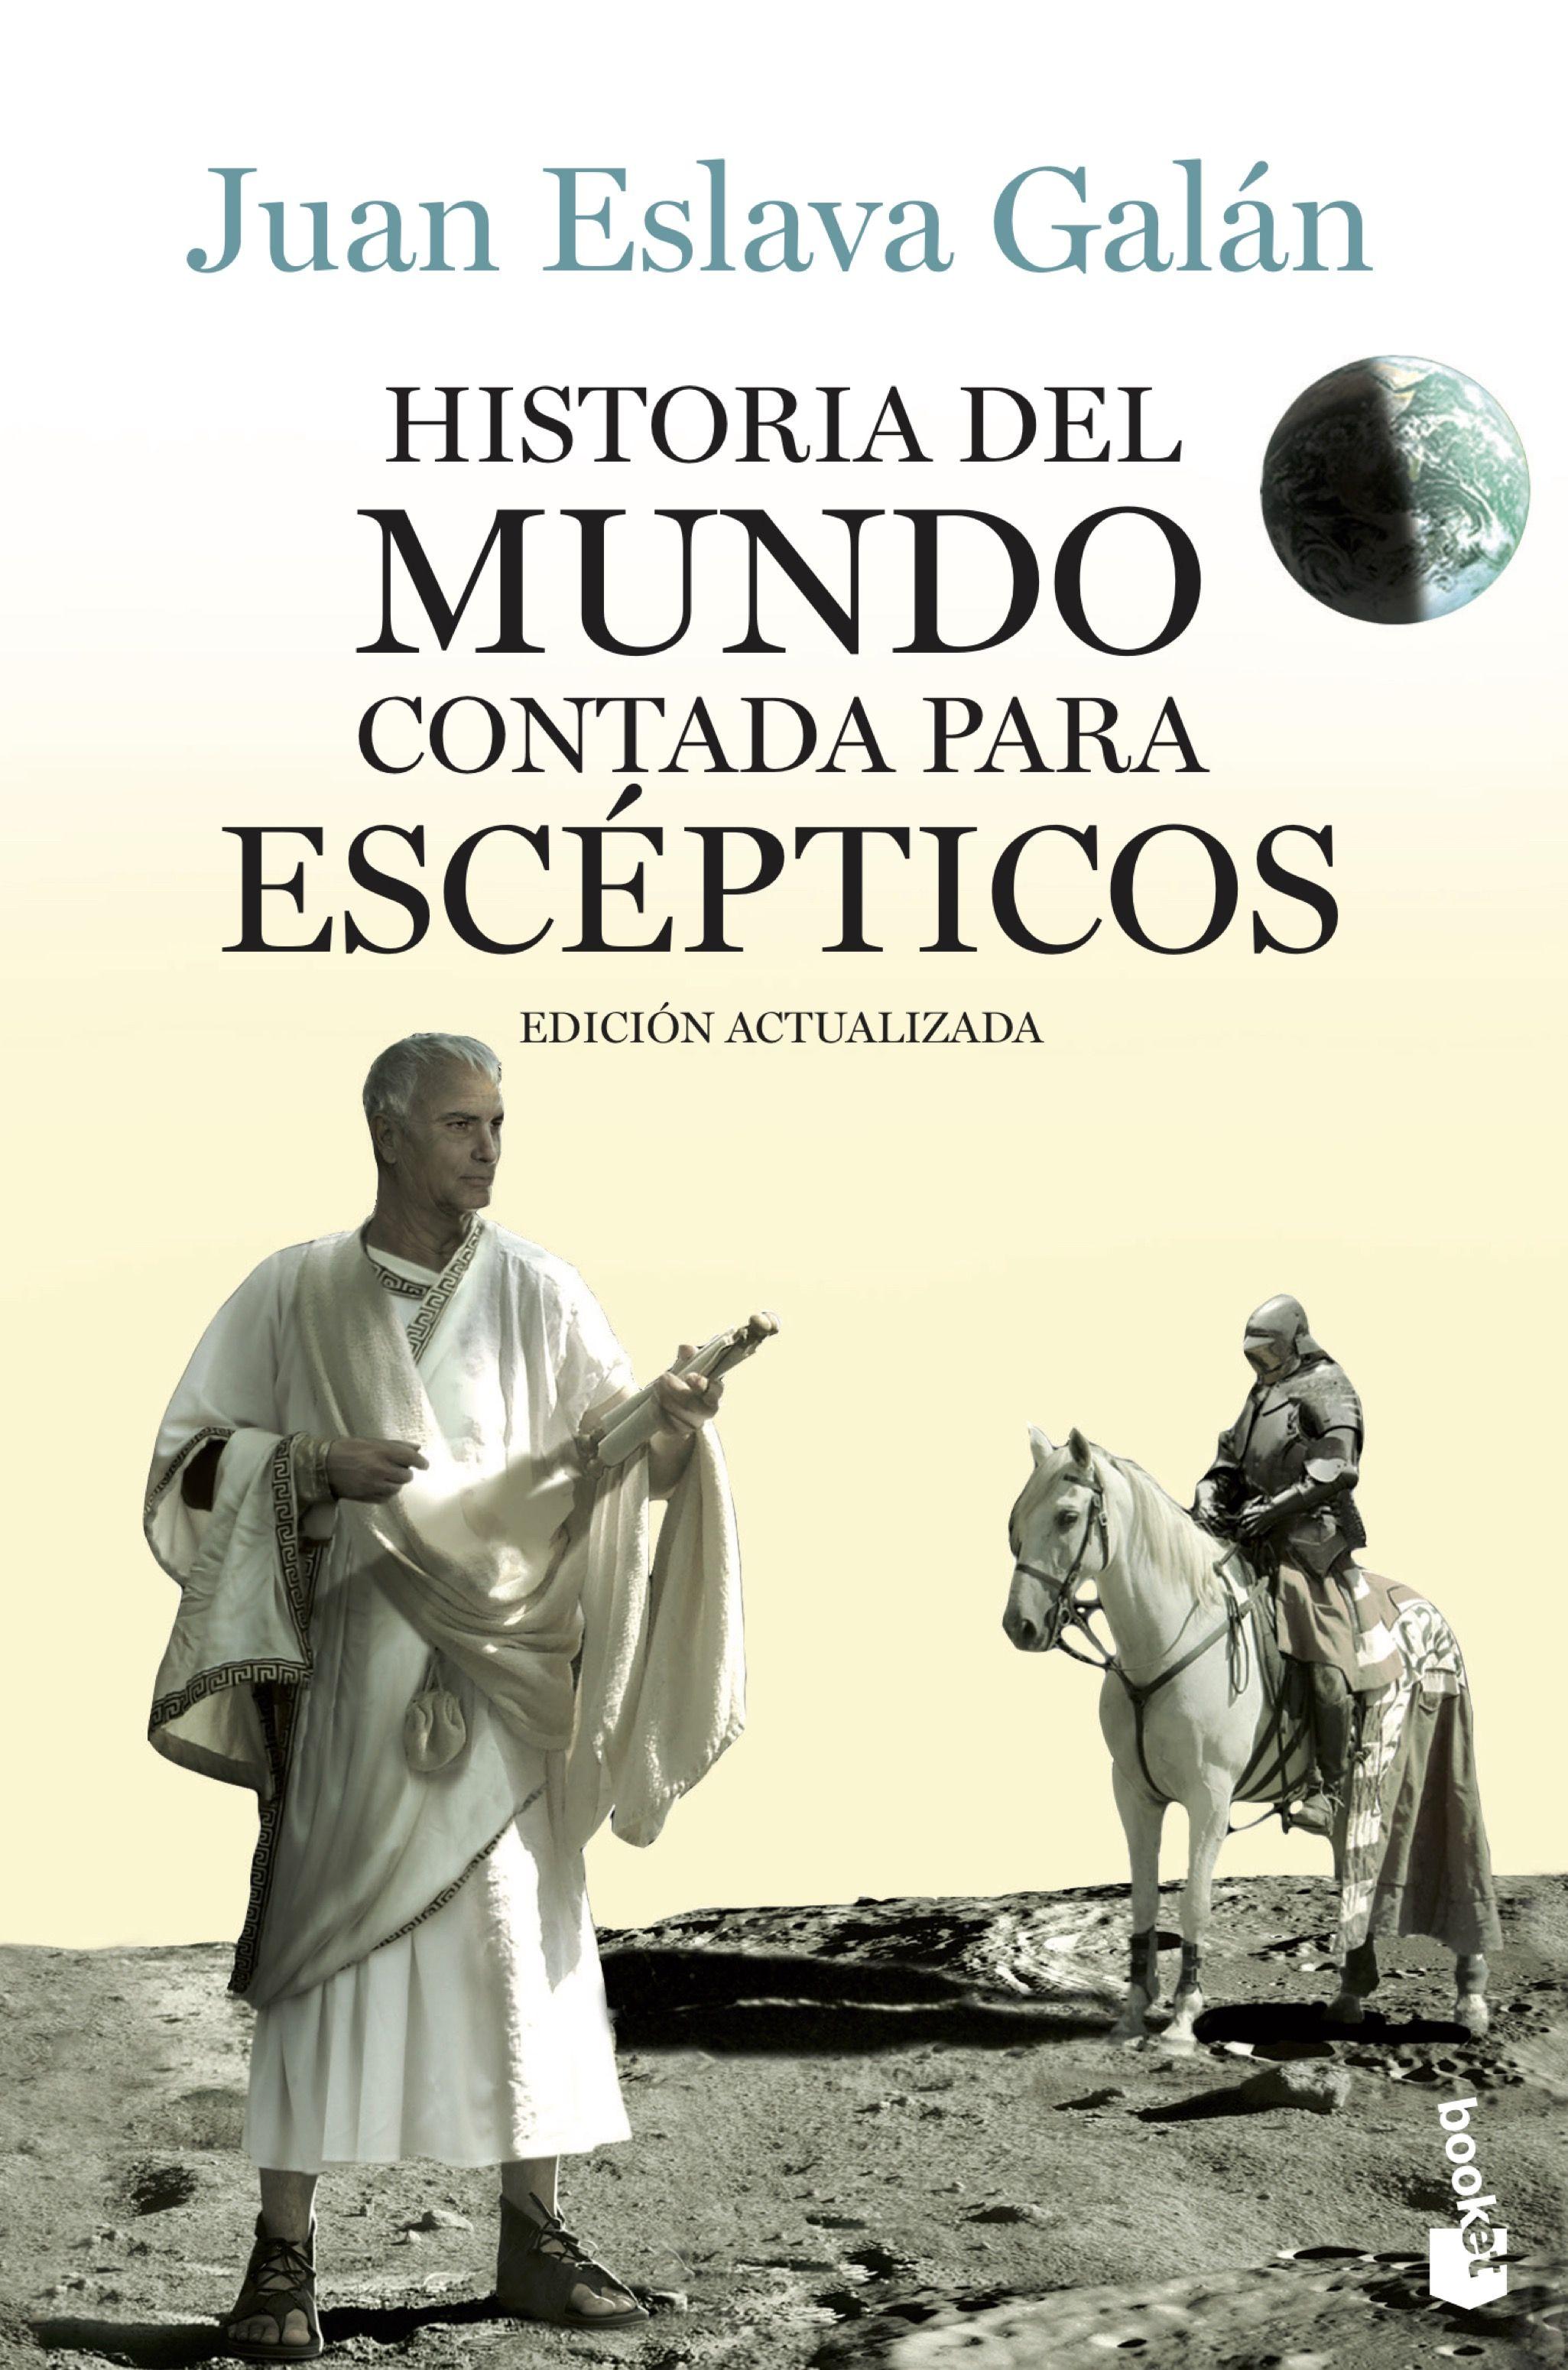 Historia Del Mundo Contada Para Escepticos por Juan Eslava Galan